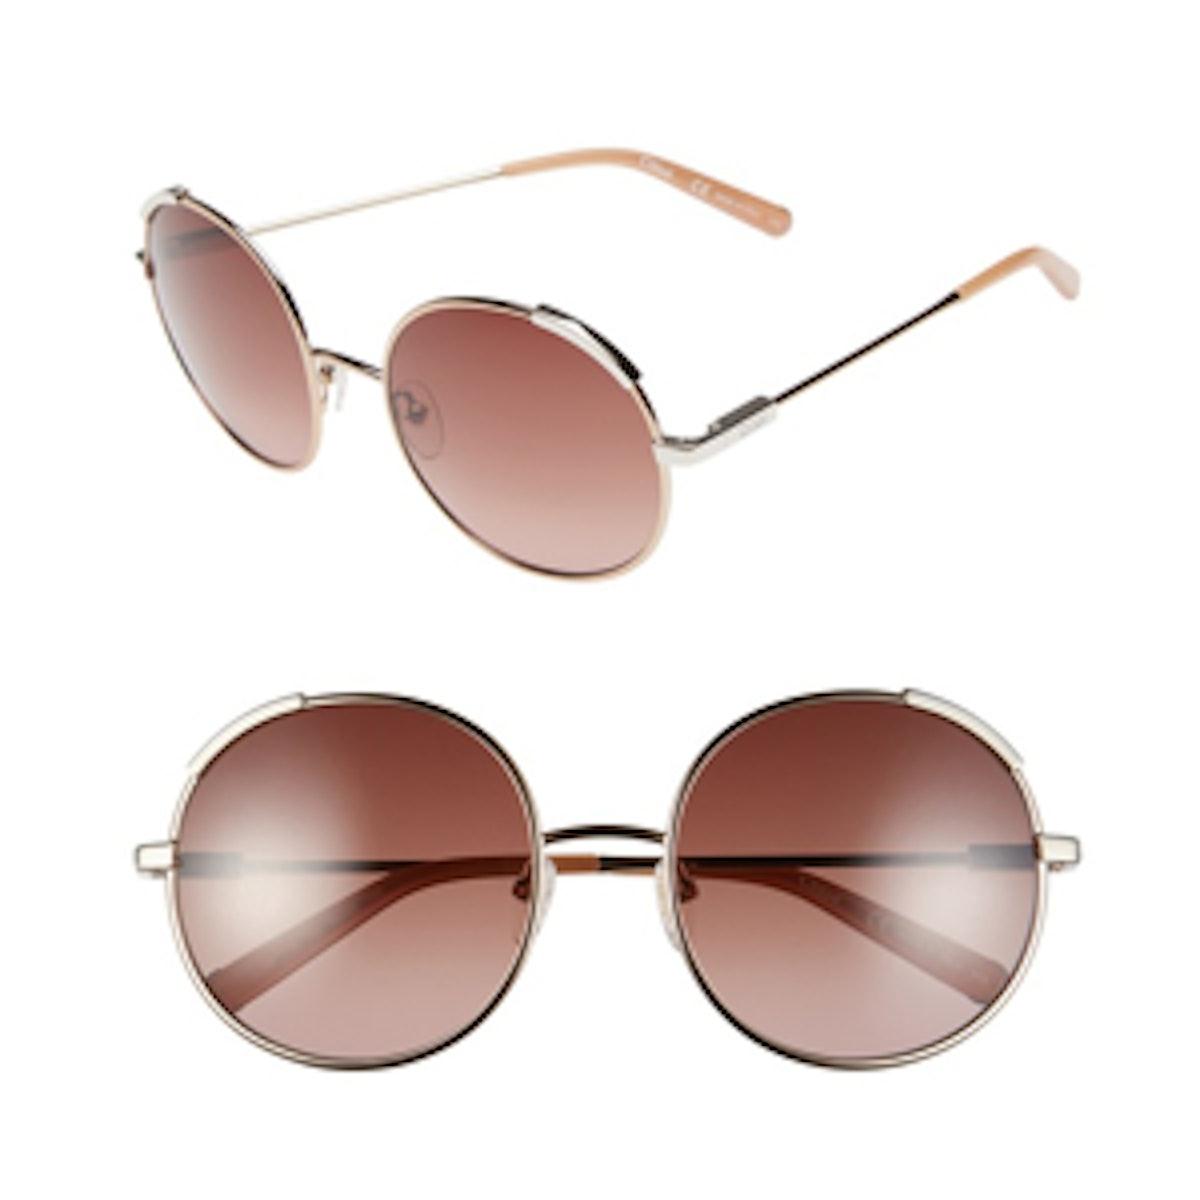 Nerine Round Sunglasses